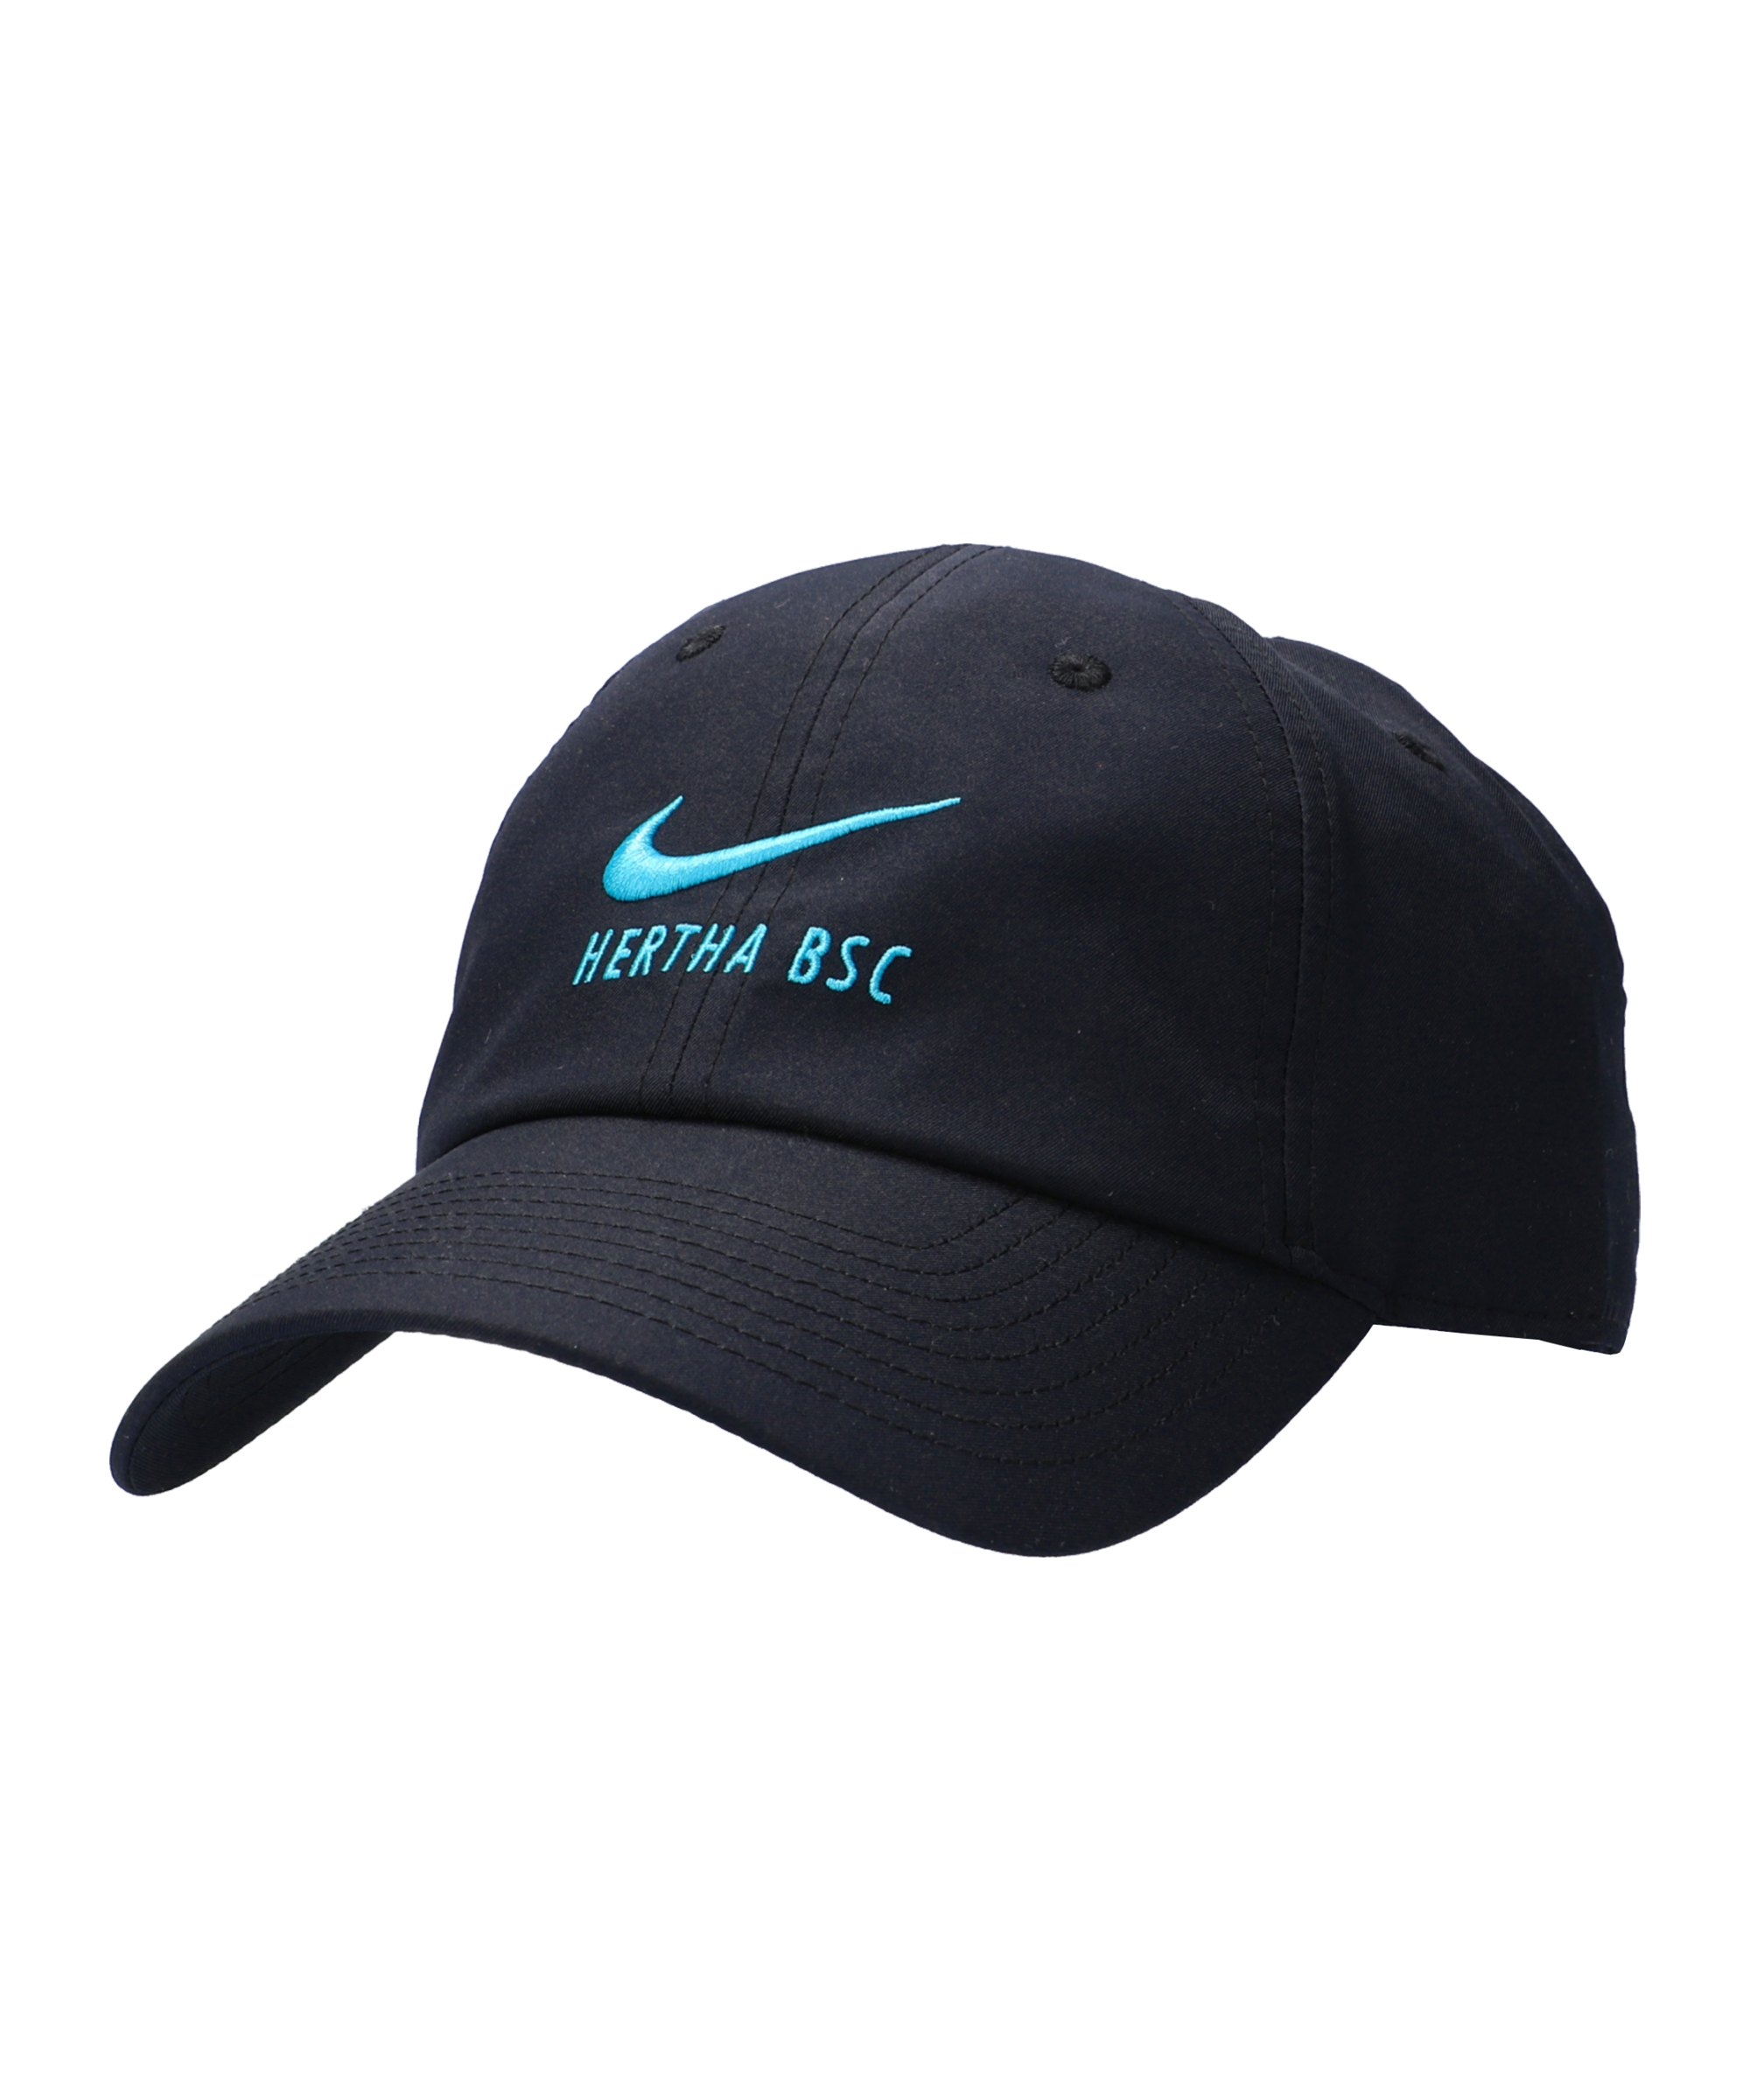 Nike Hertha BSC Heritage 86 Cap Schwarz F010 - schwarz